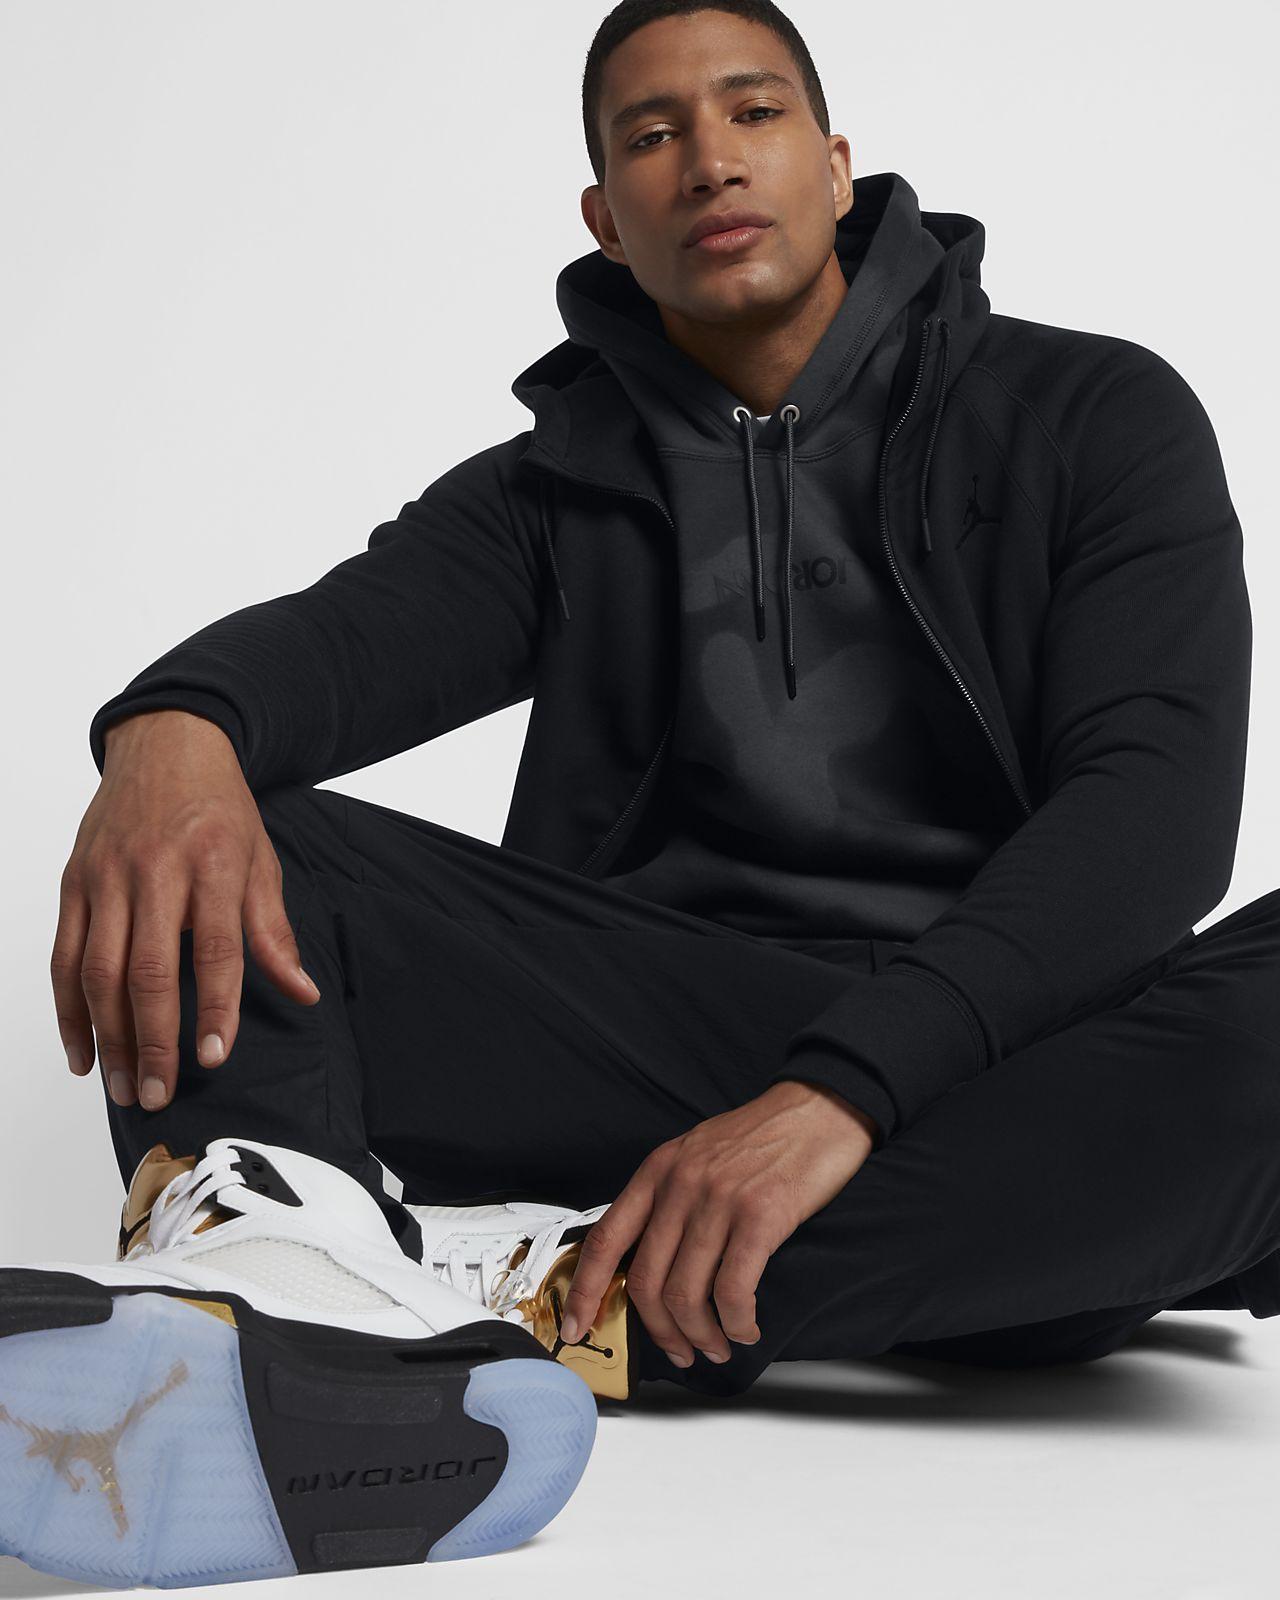 05e13b477 Jordan Lifestyle Wings Fleece Men s Full-Zip Hoodie. Nike.com AU